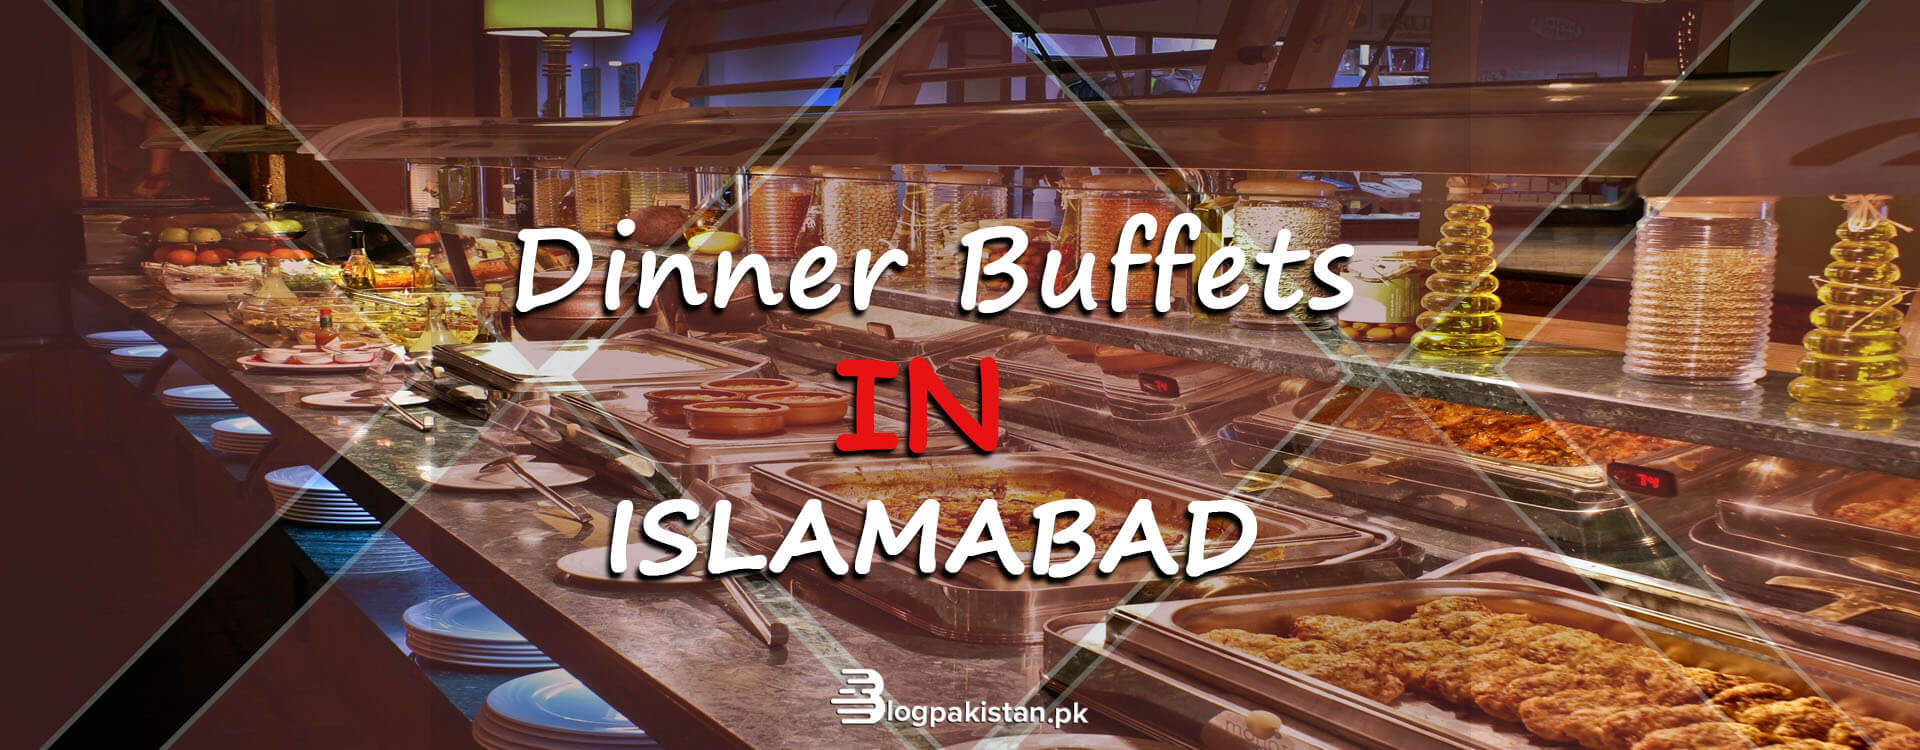 Dinner Buffet in Islamabad